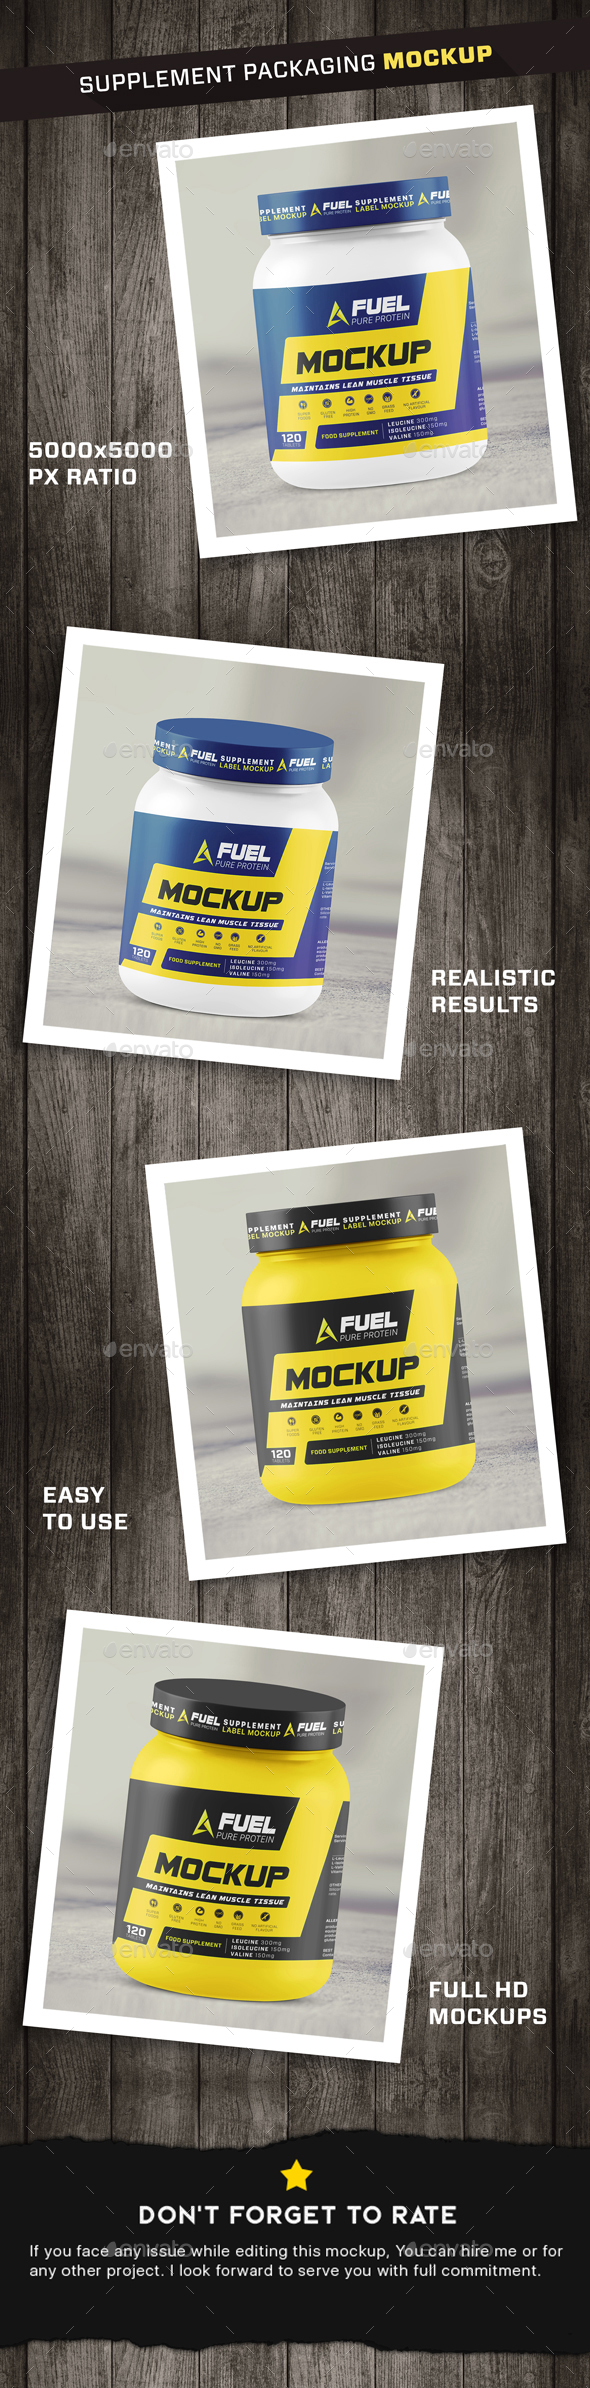 GraphicRiver Protein Powder Supplement Mockup 21173704